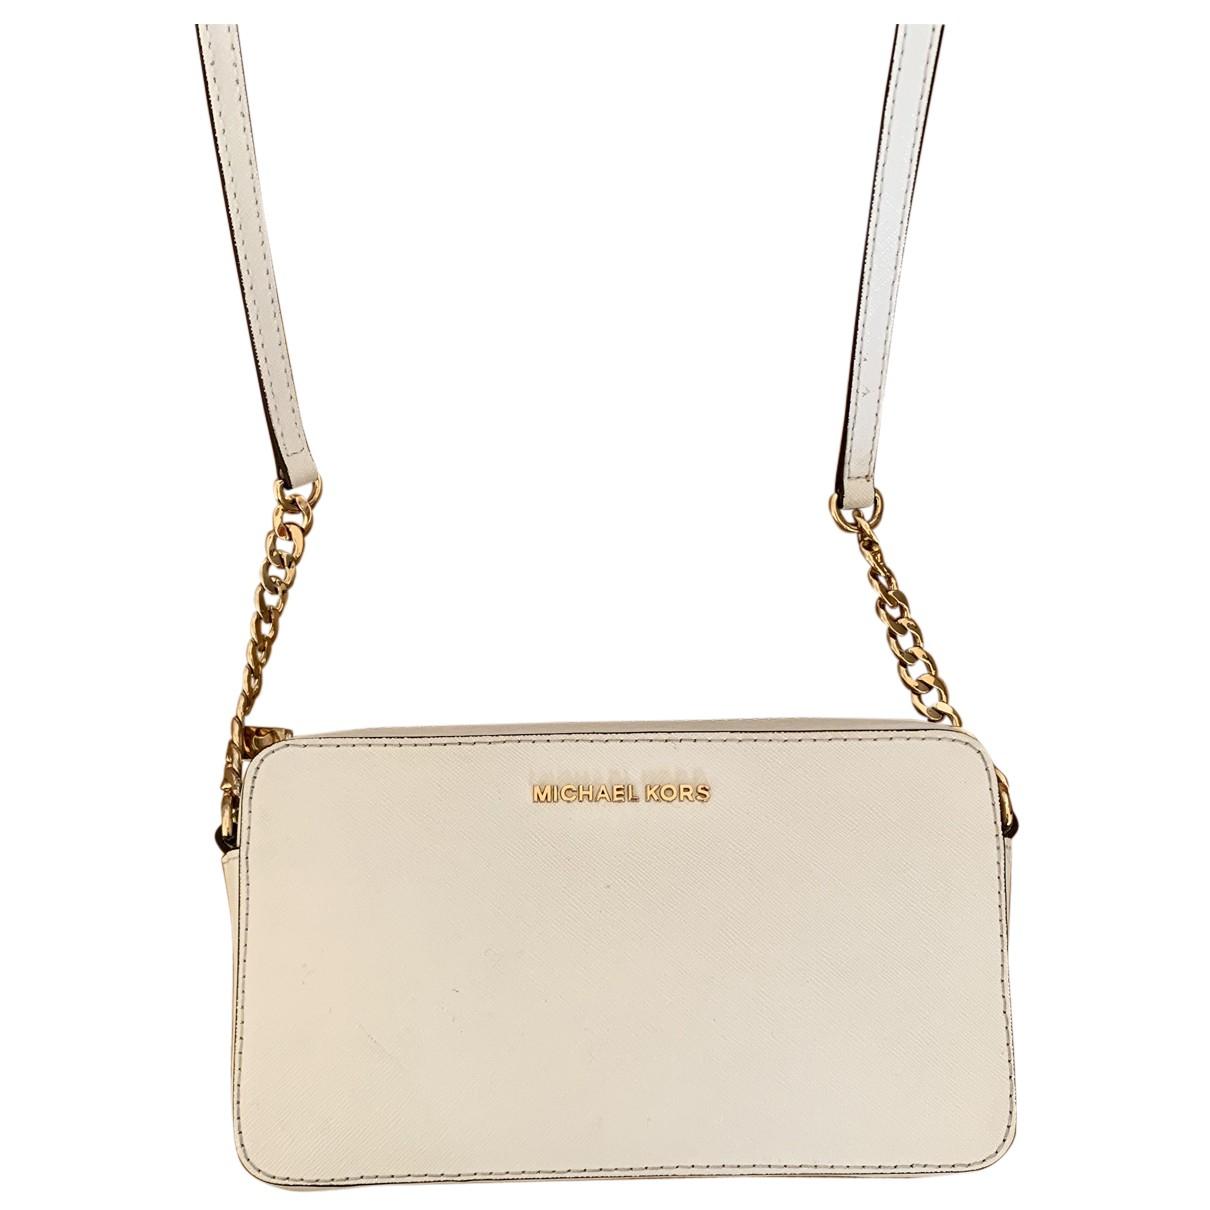 Michael Kors Jet Set White Leather Clutch bag for Women N